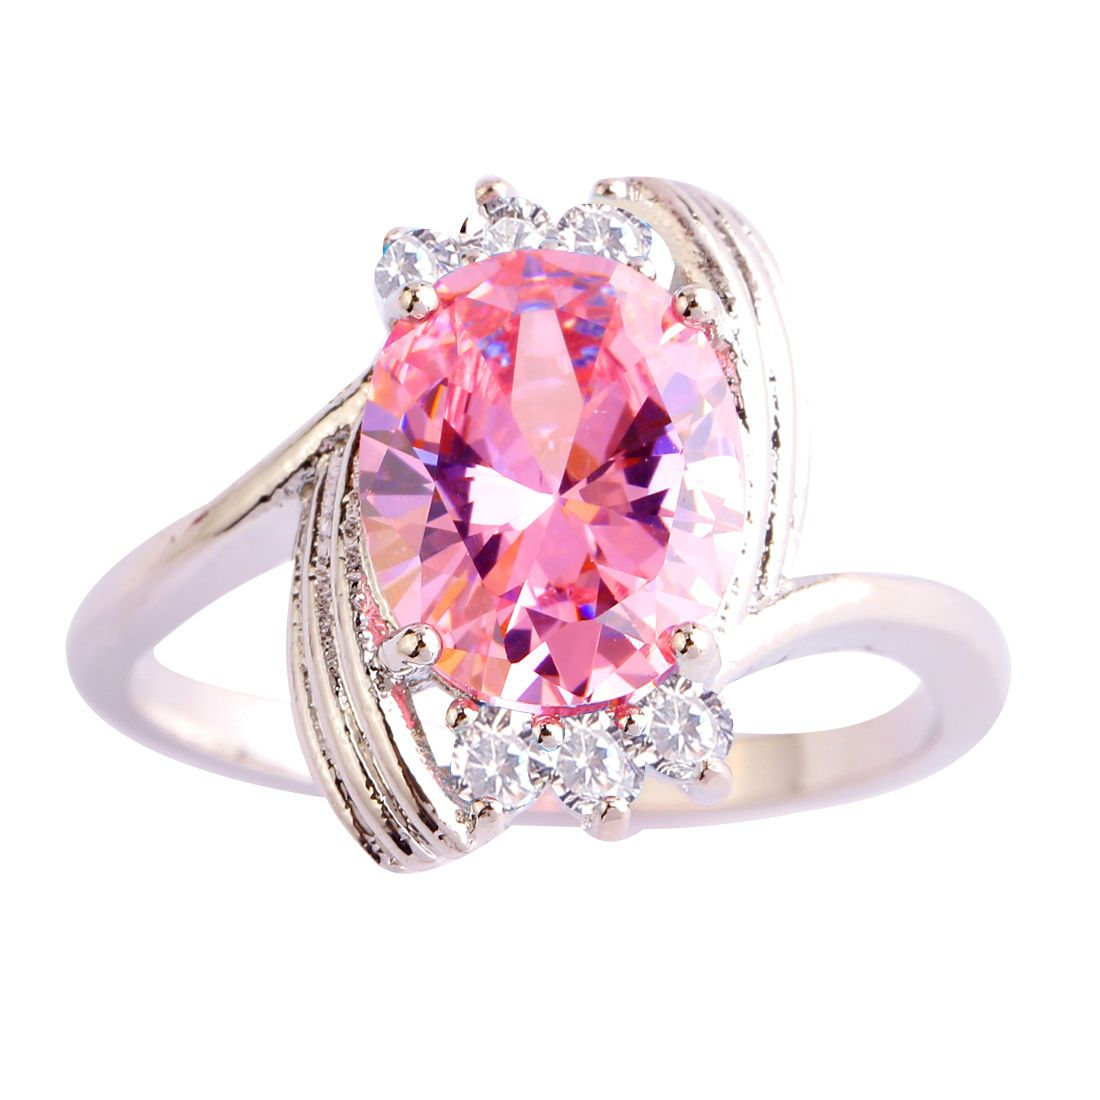 Lovely Women Wedding Pink & White Topaz Gemstone Silver Ring Sz 6 7 ...